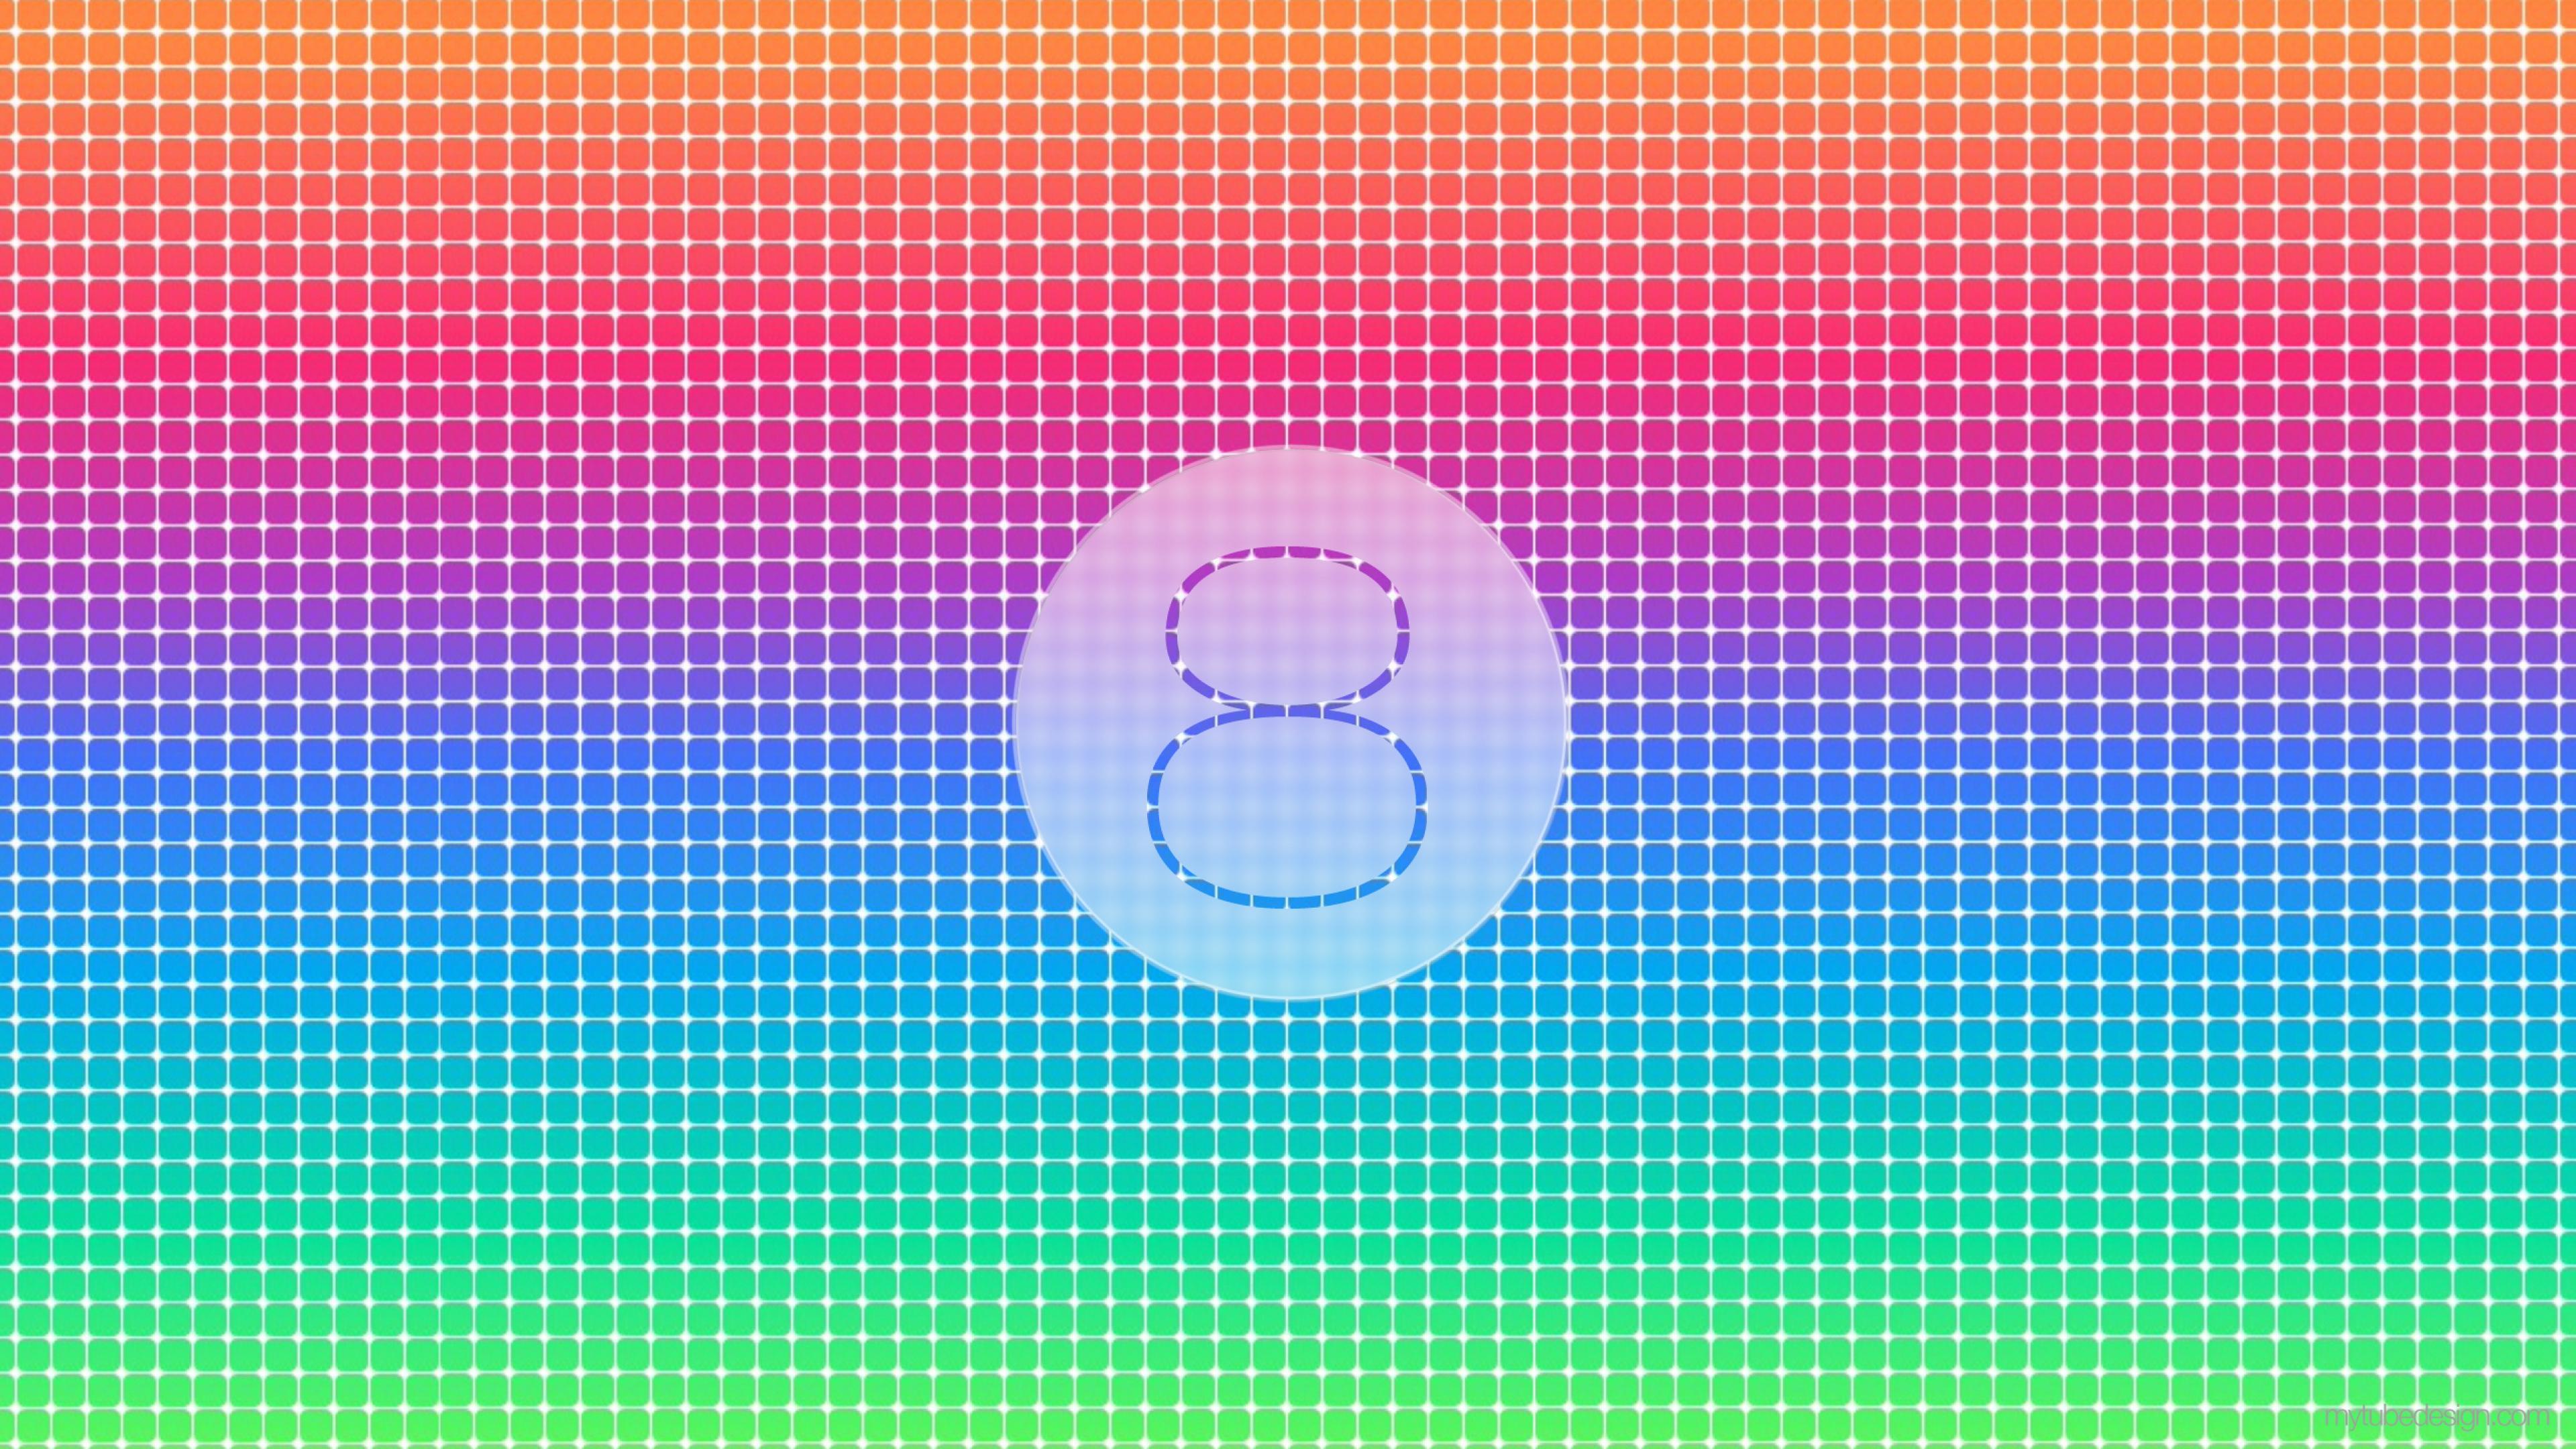 3840x2160 Ios 8 Apple Iphone Ipad Wallpaper Background 4K Ultra HD 3840x2160